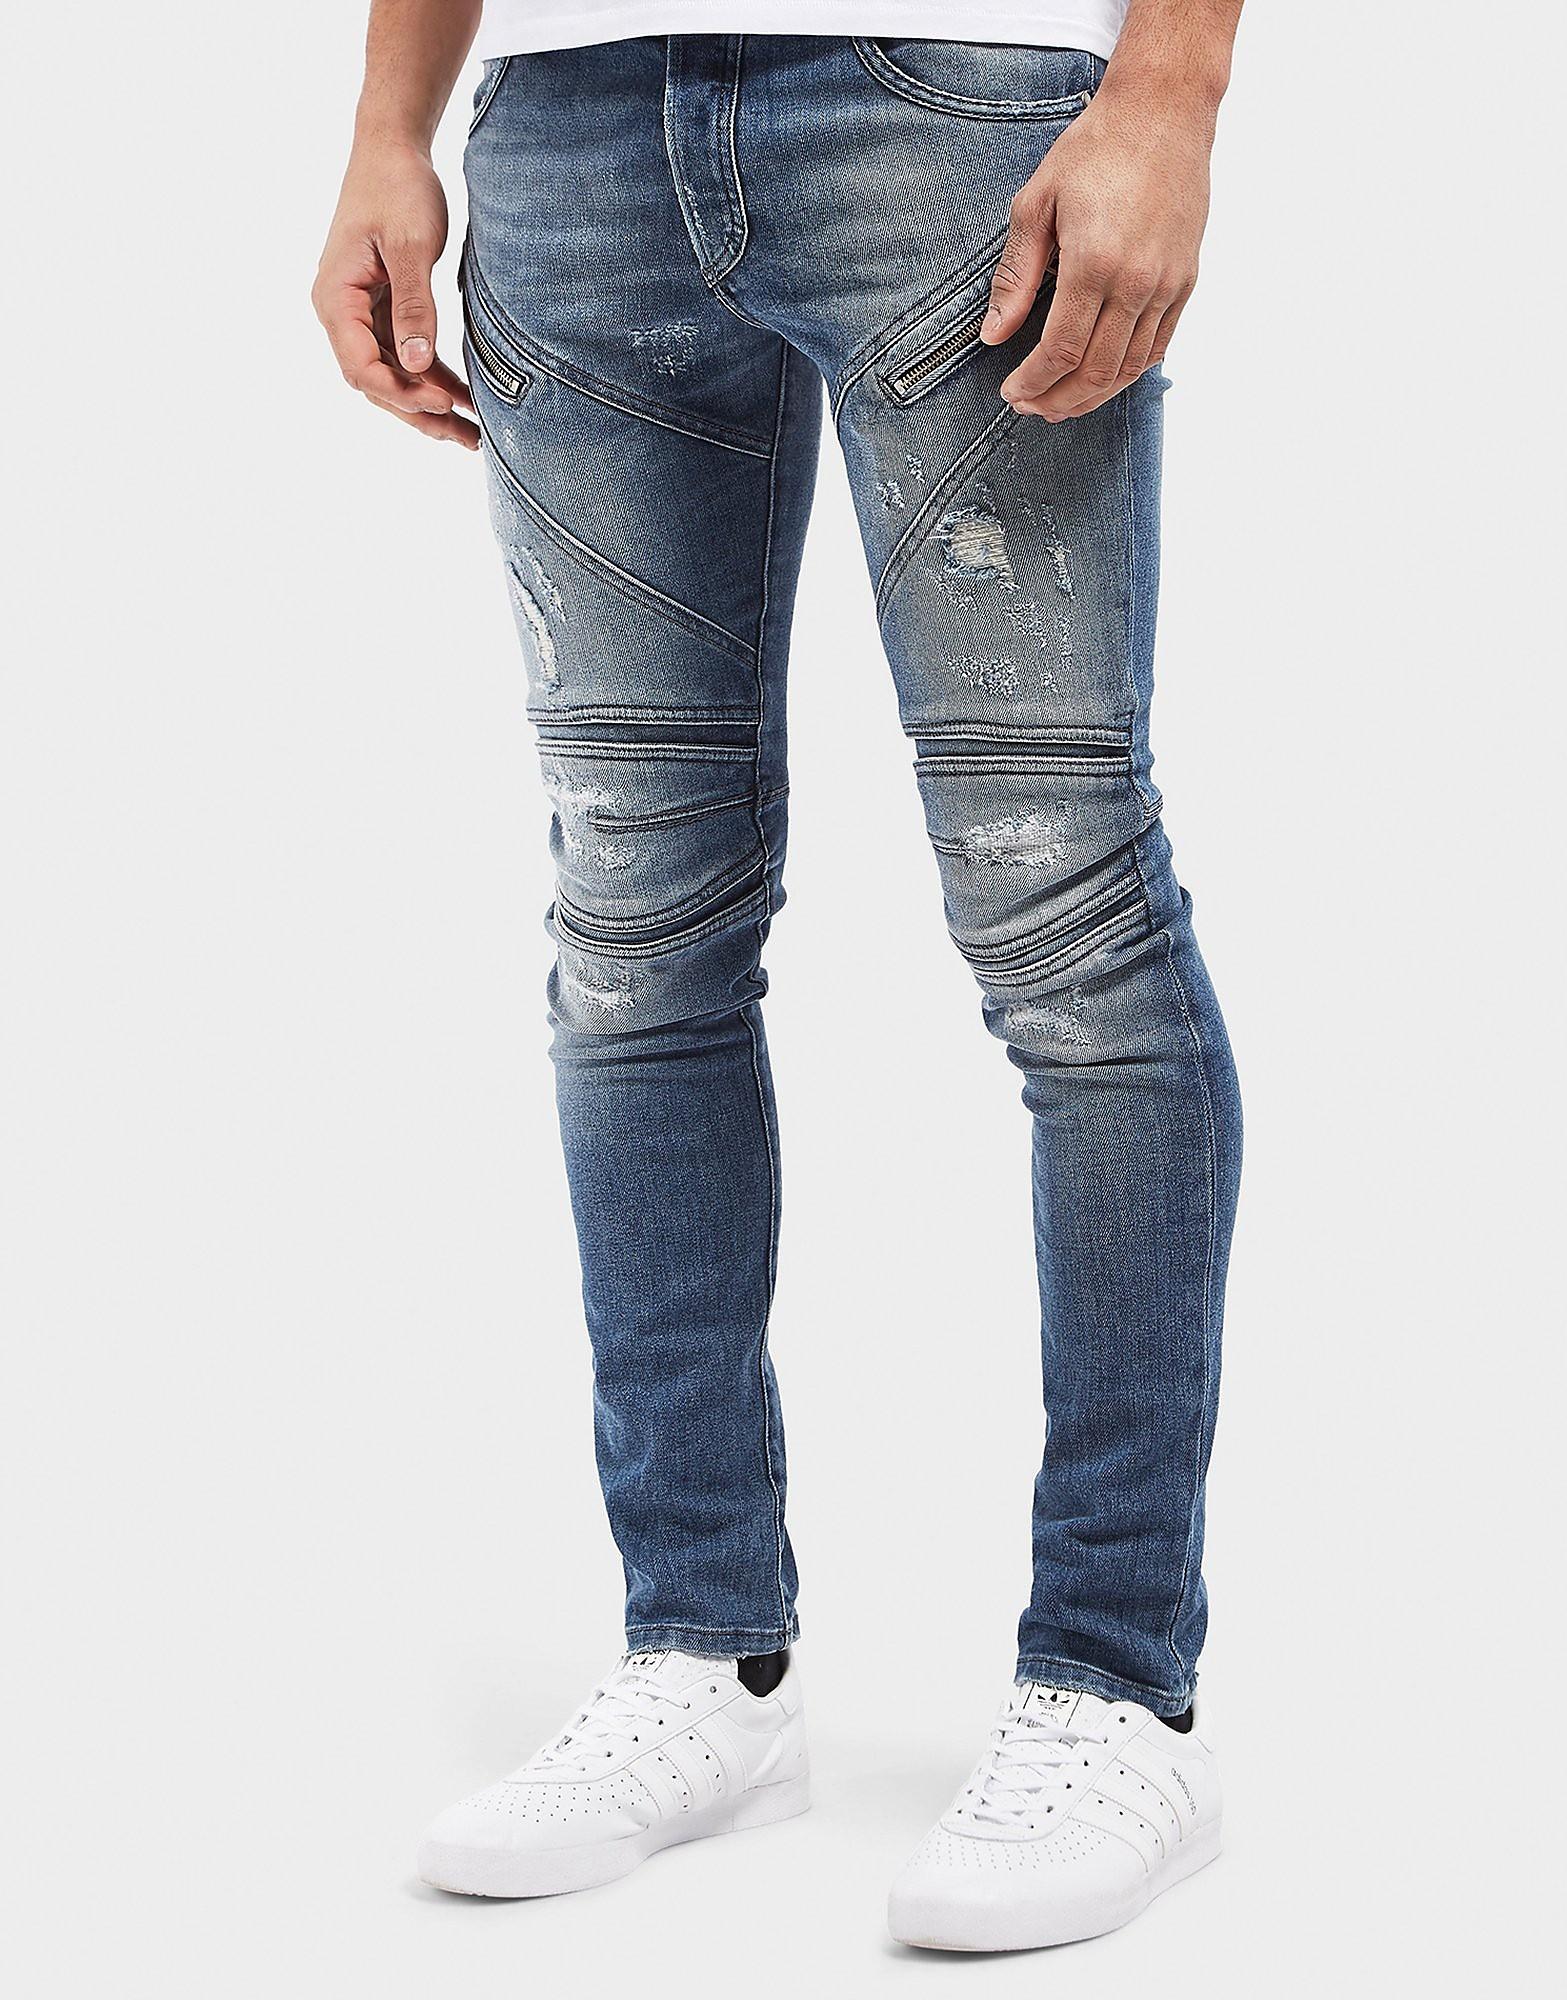 Just Cavalli Zip Biker Skinny Jeans